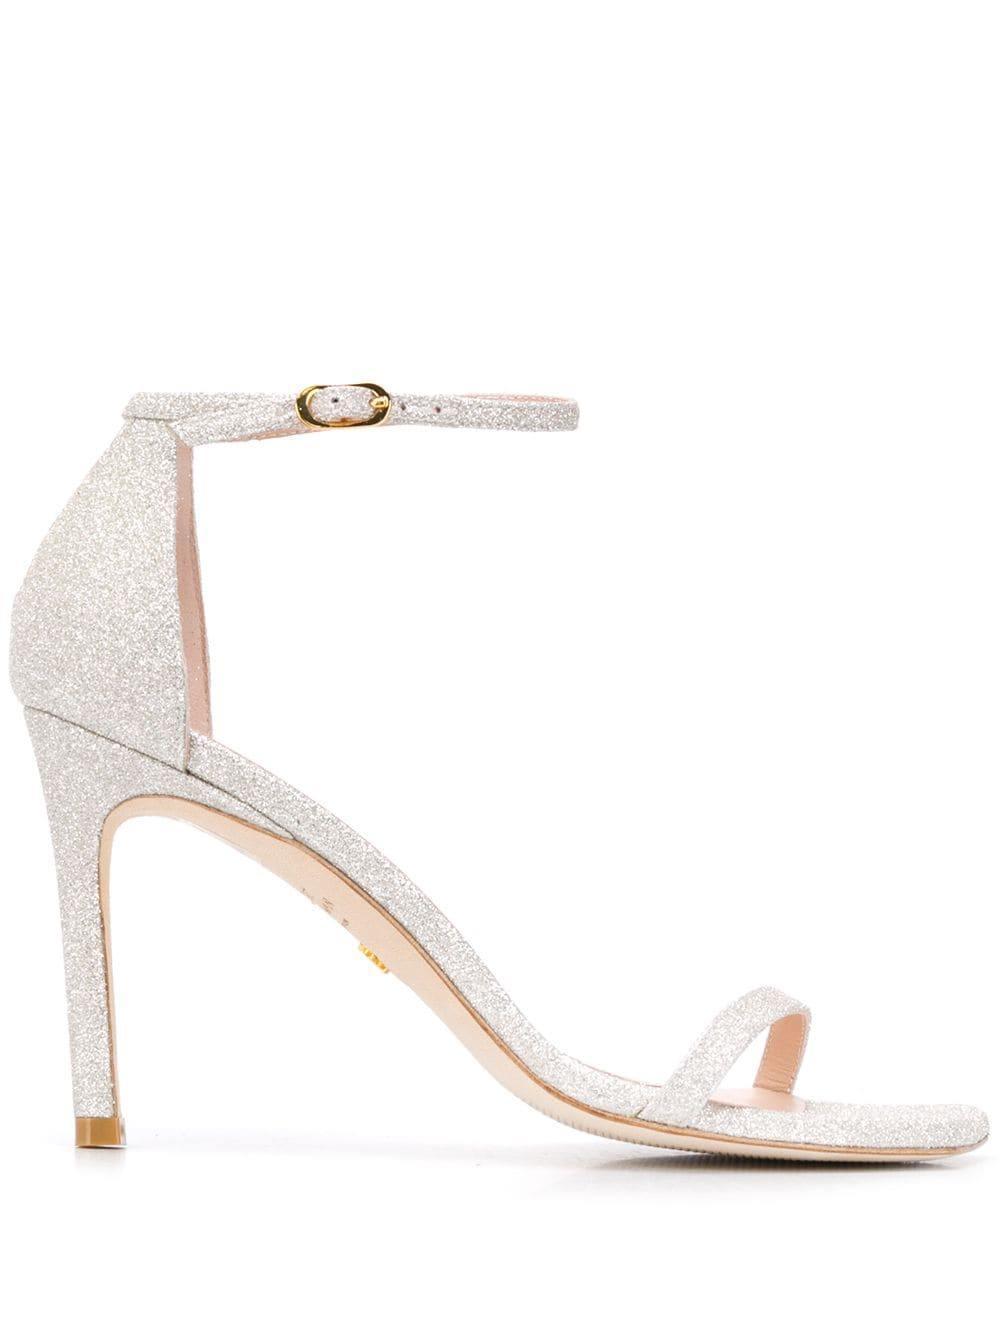 Amelina 95mm Glitter Sandal Item # AMELINA95